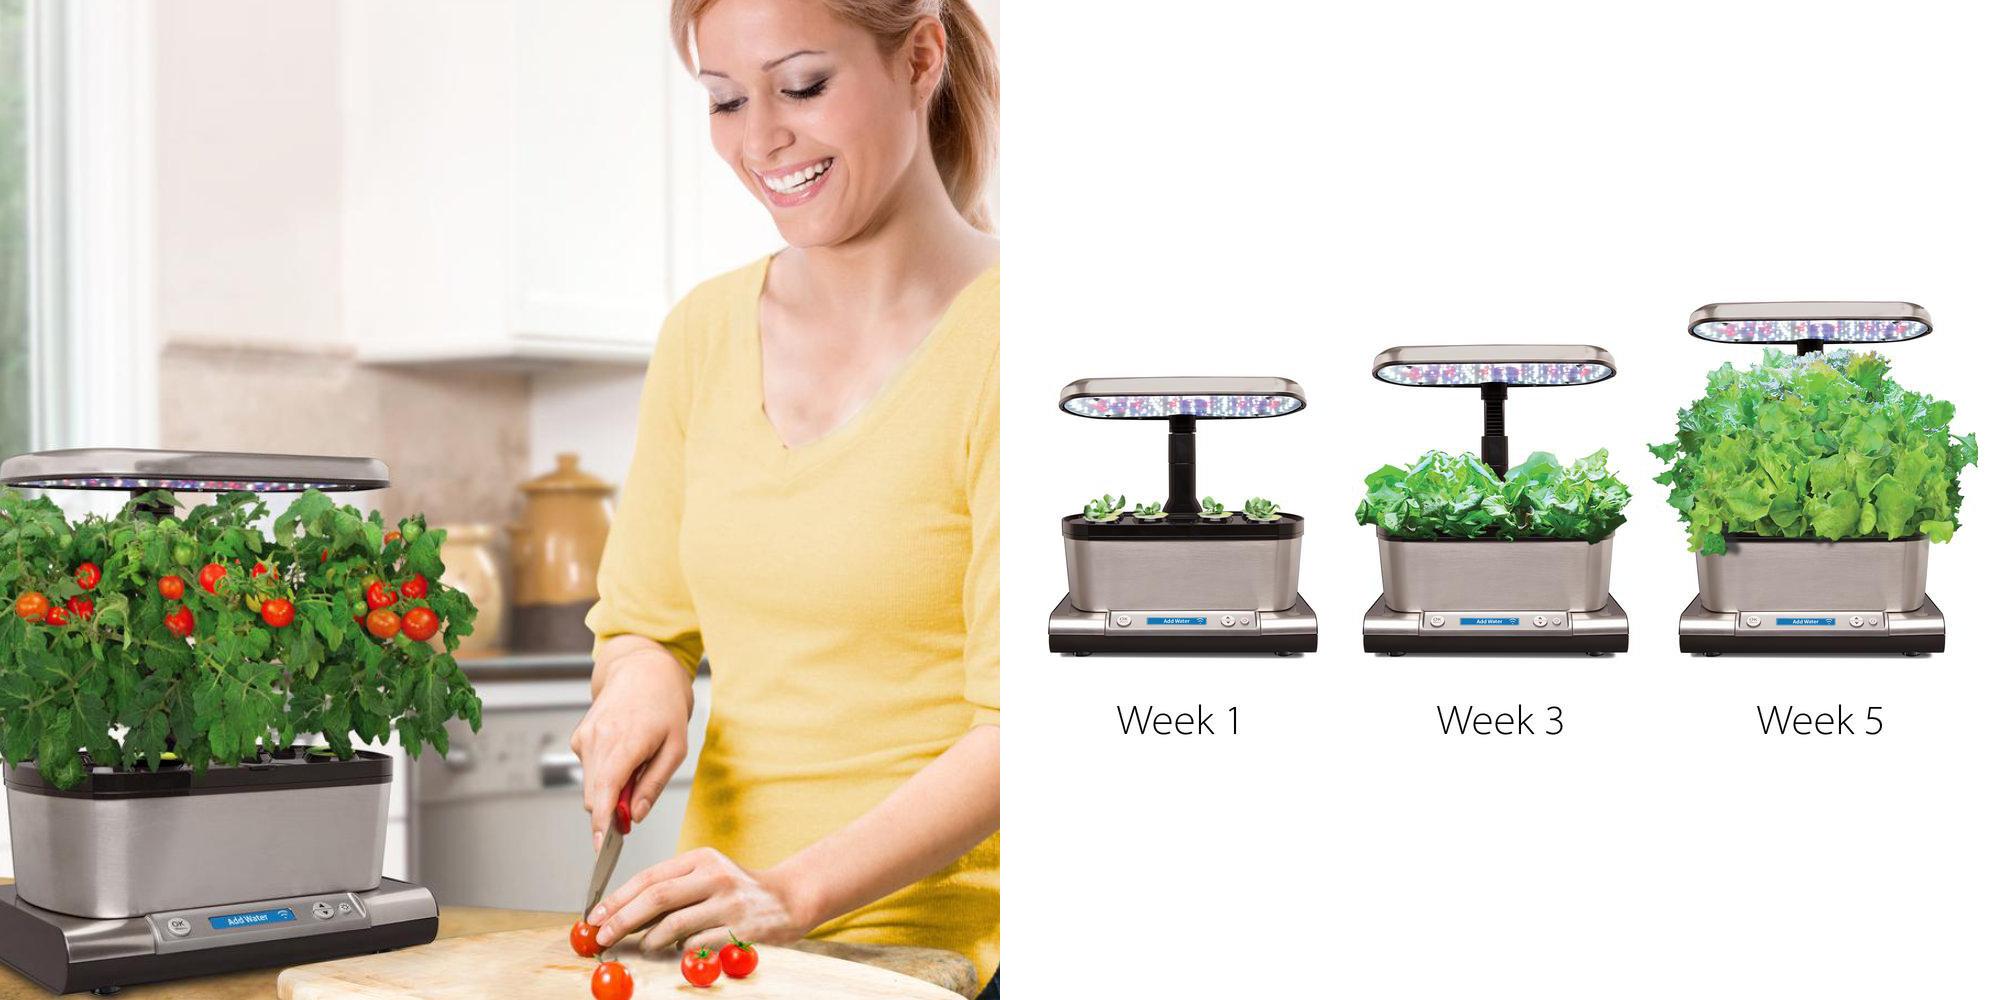 Grow veggies using an iPhone w/ AeroGarden's Harvest Elite for $100 (50% off), more